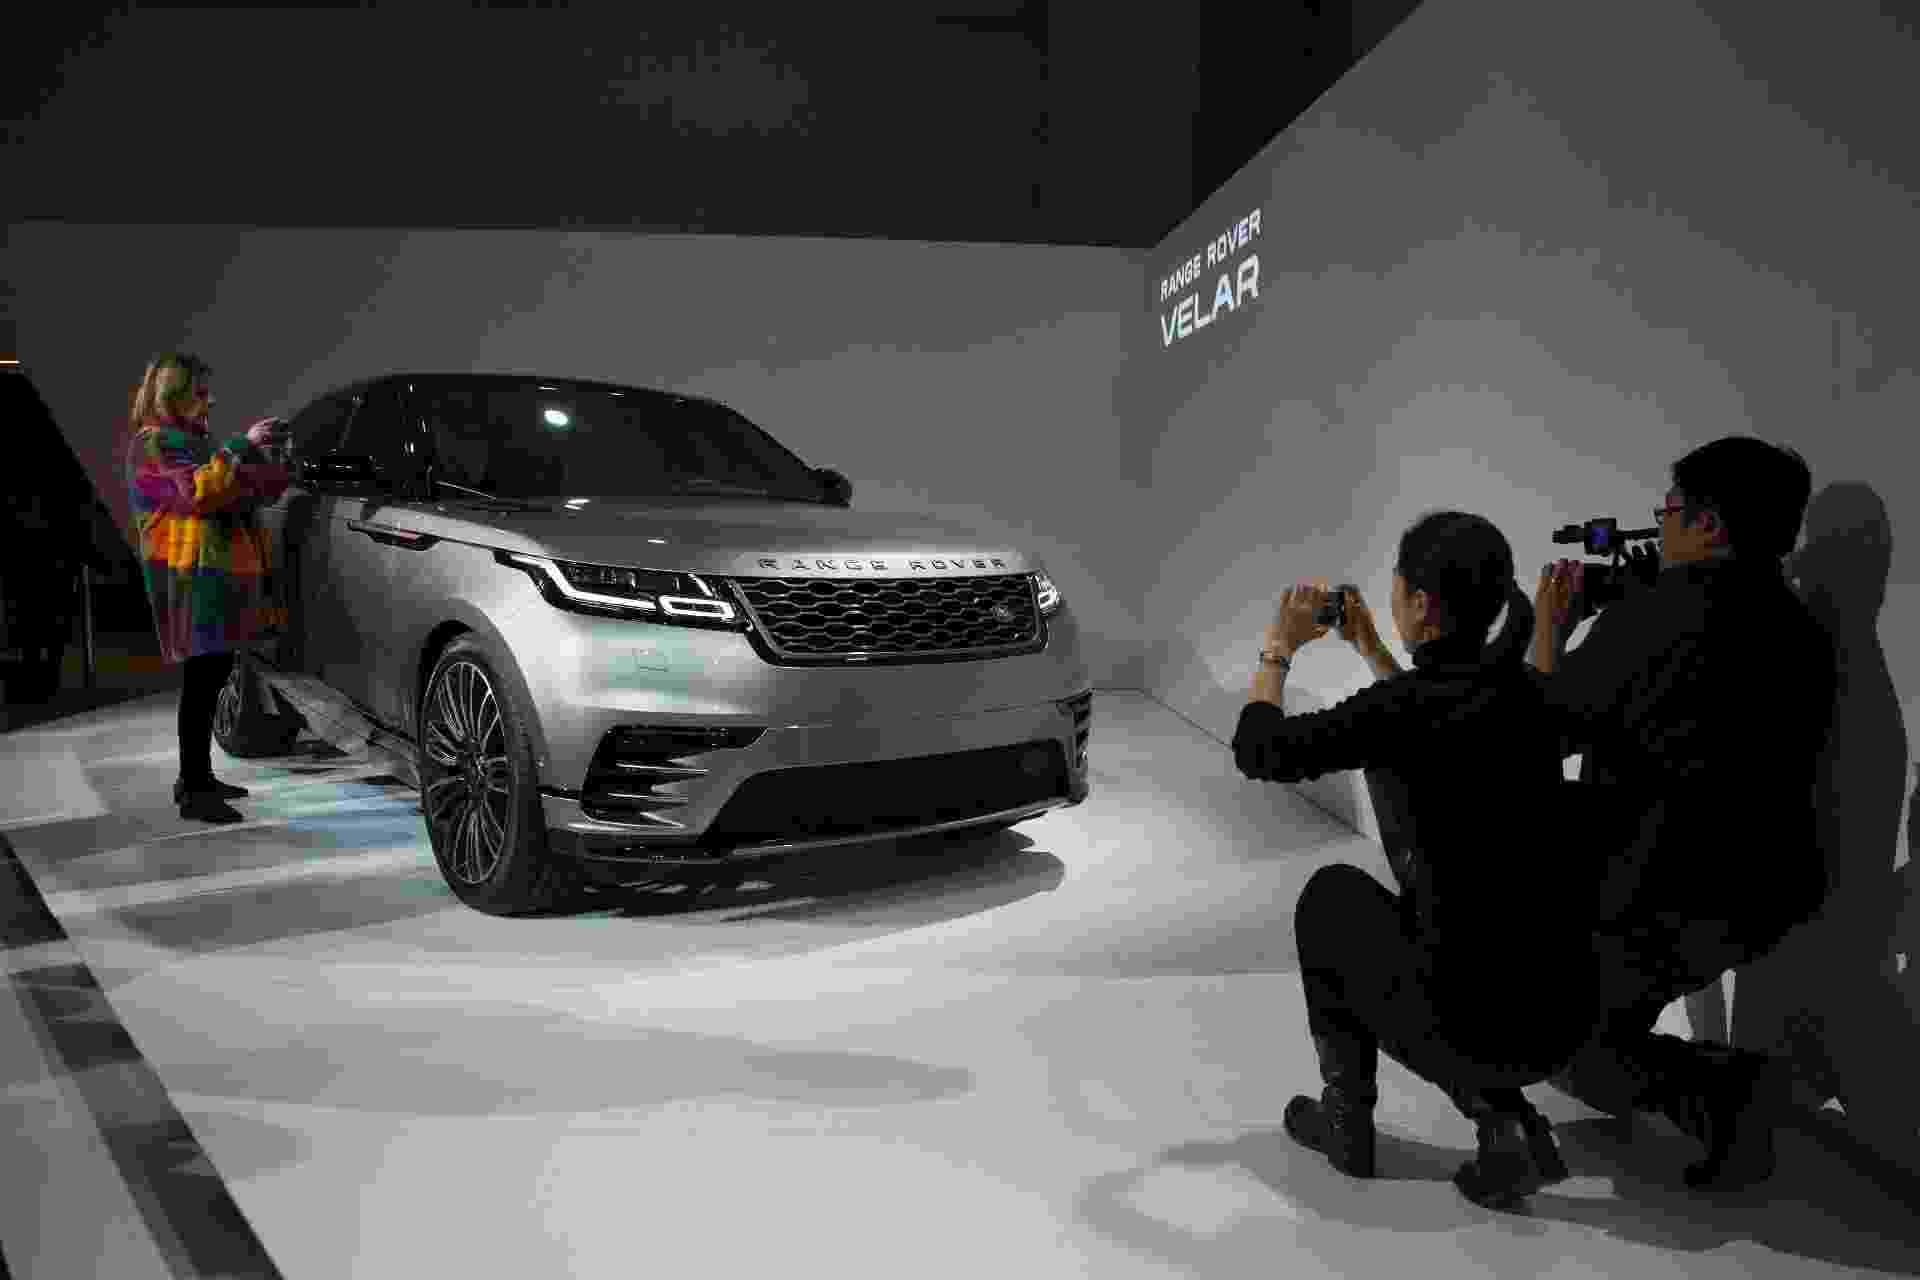 Range Rover Velar - Daniel Leal-Olivas/AFP